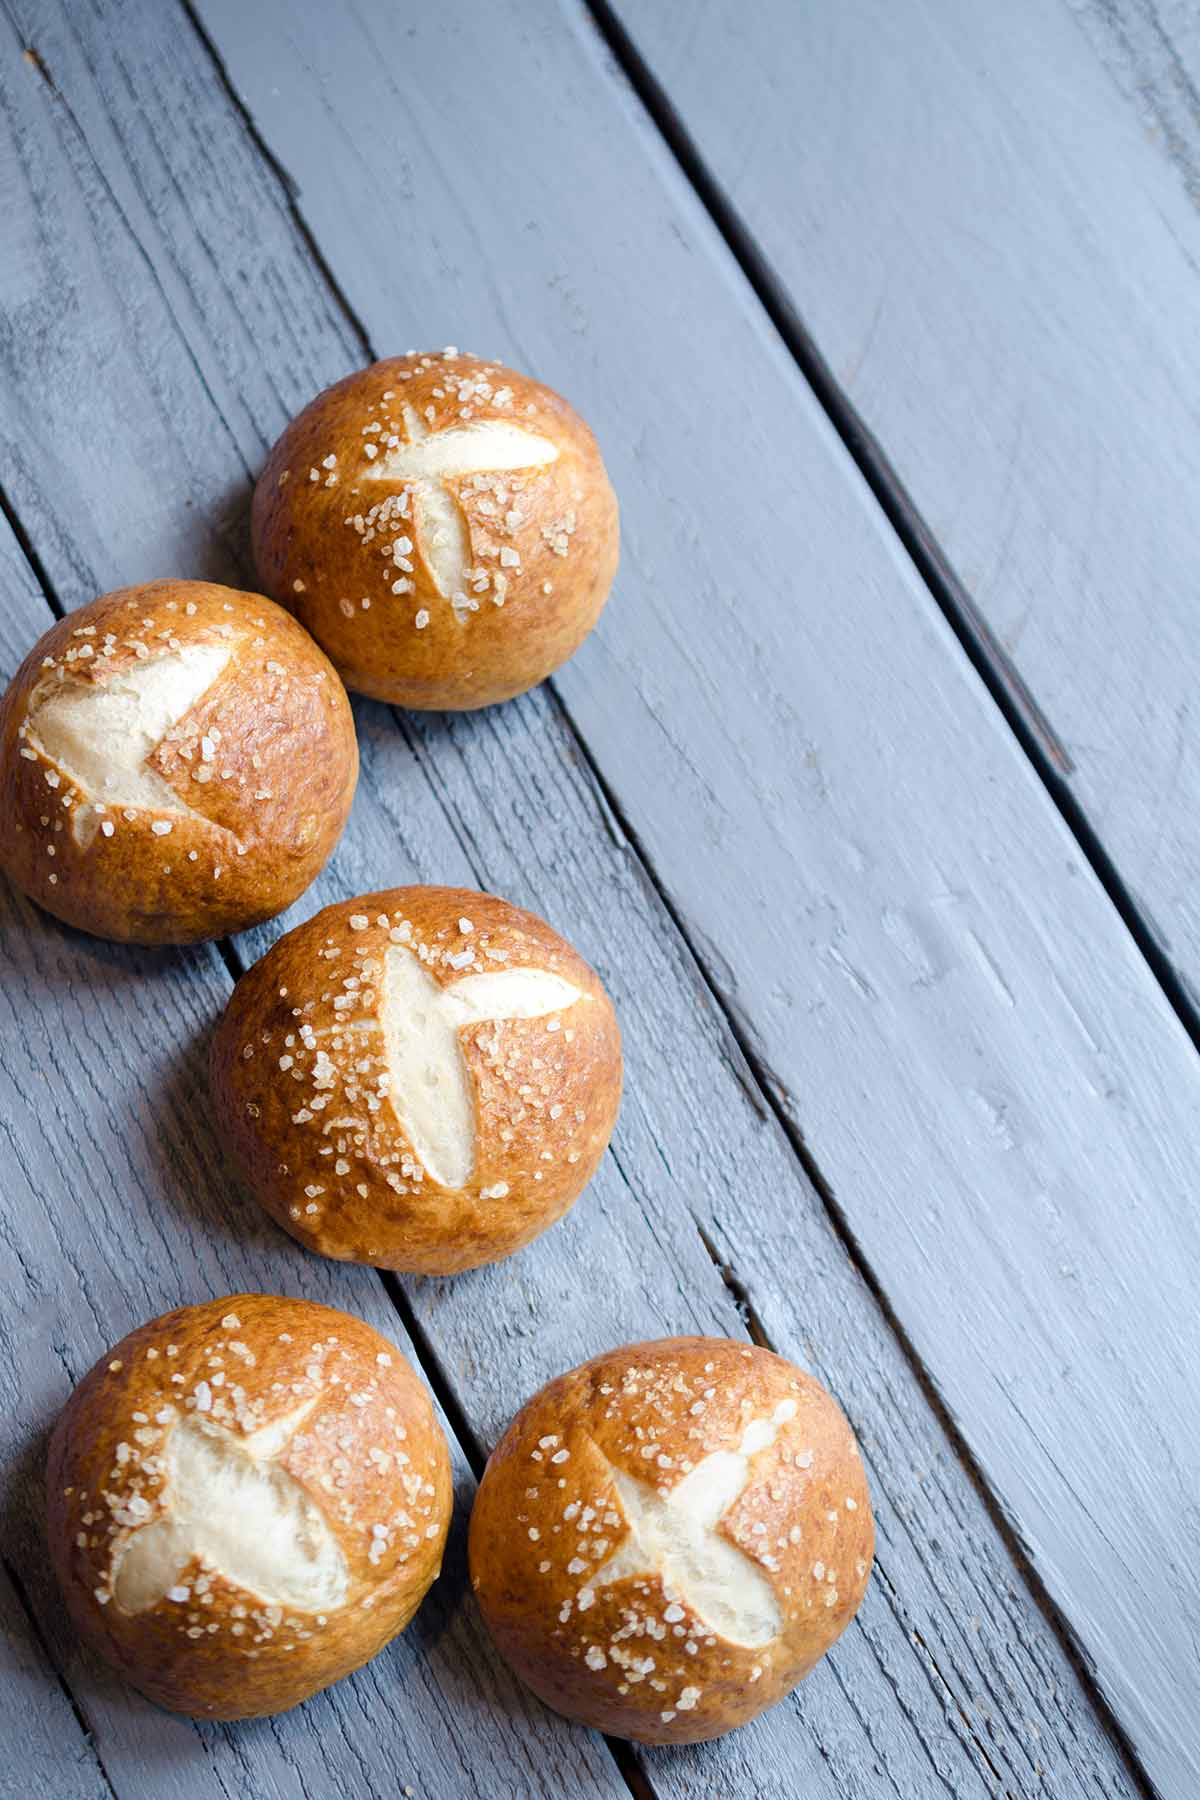 Photo of the finished pretzel bun recipe. Multiple pretzel rolls on a wood backdrop.